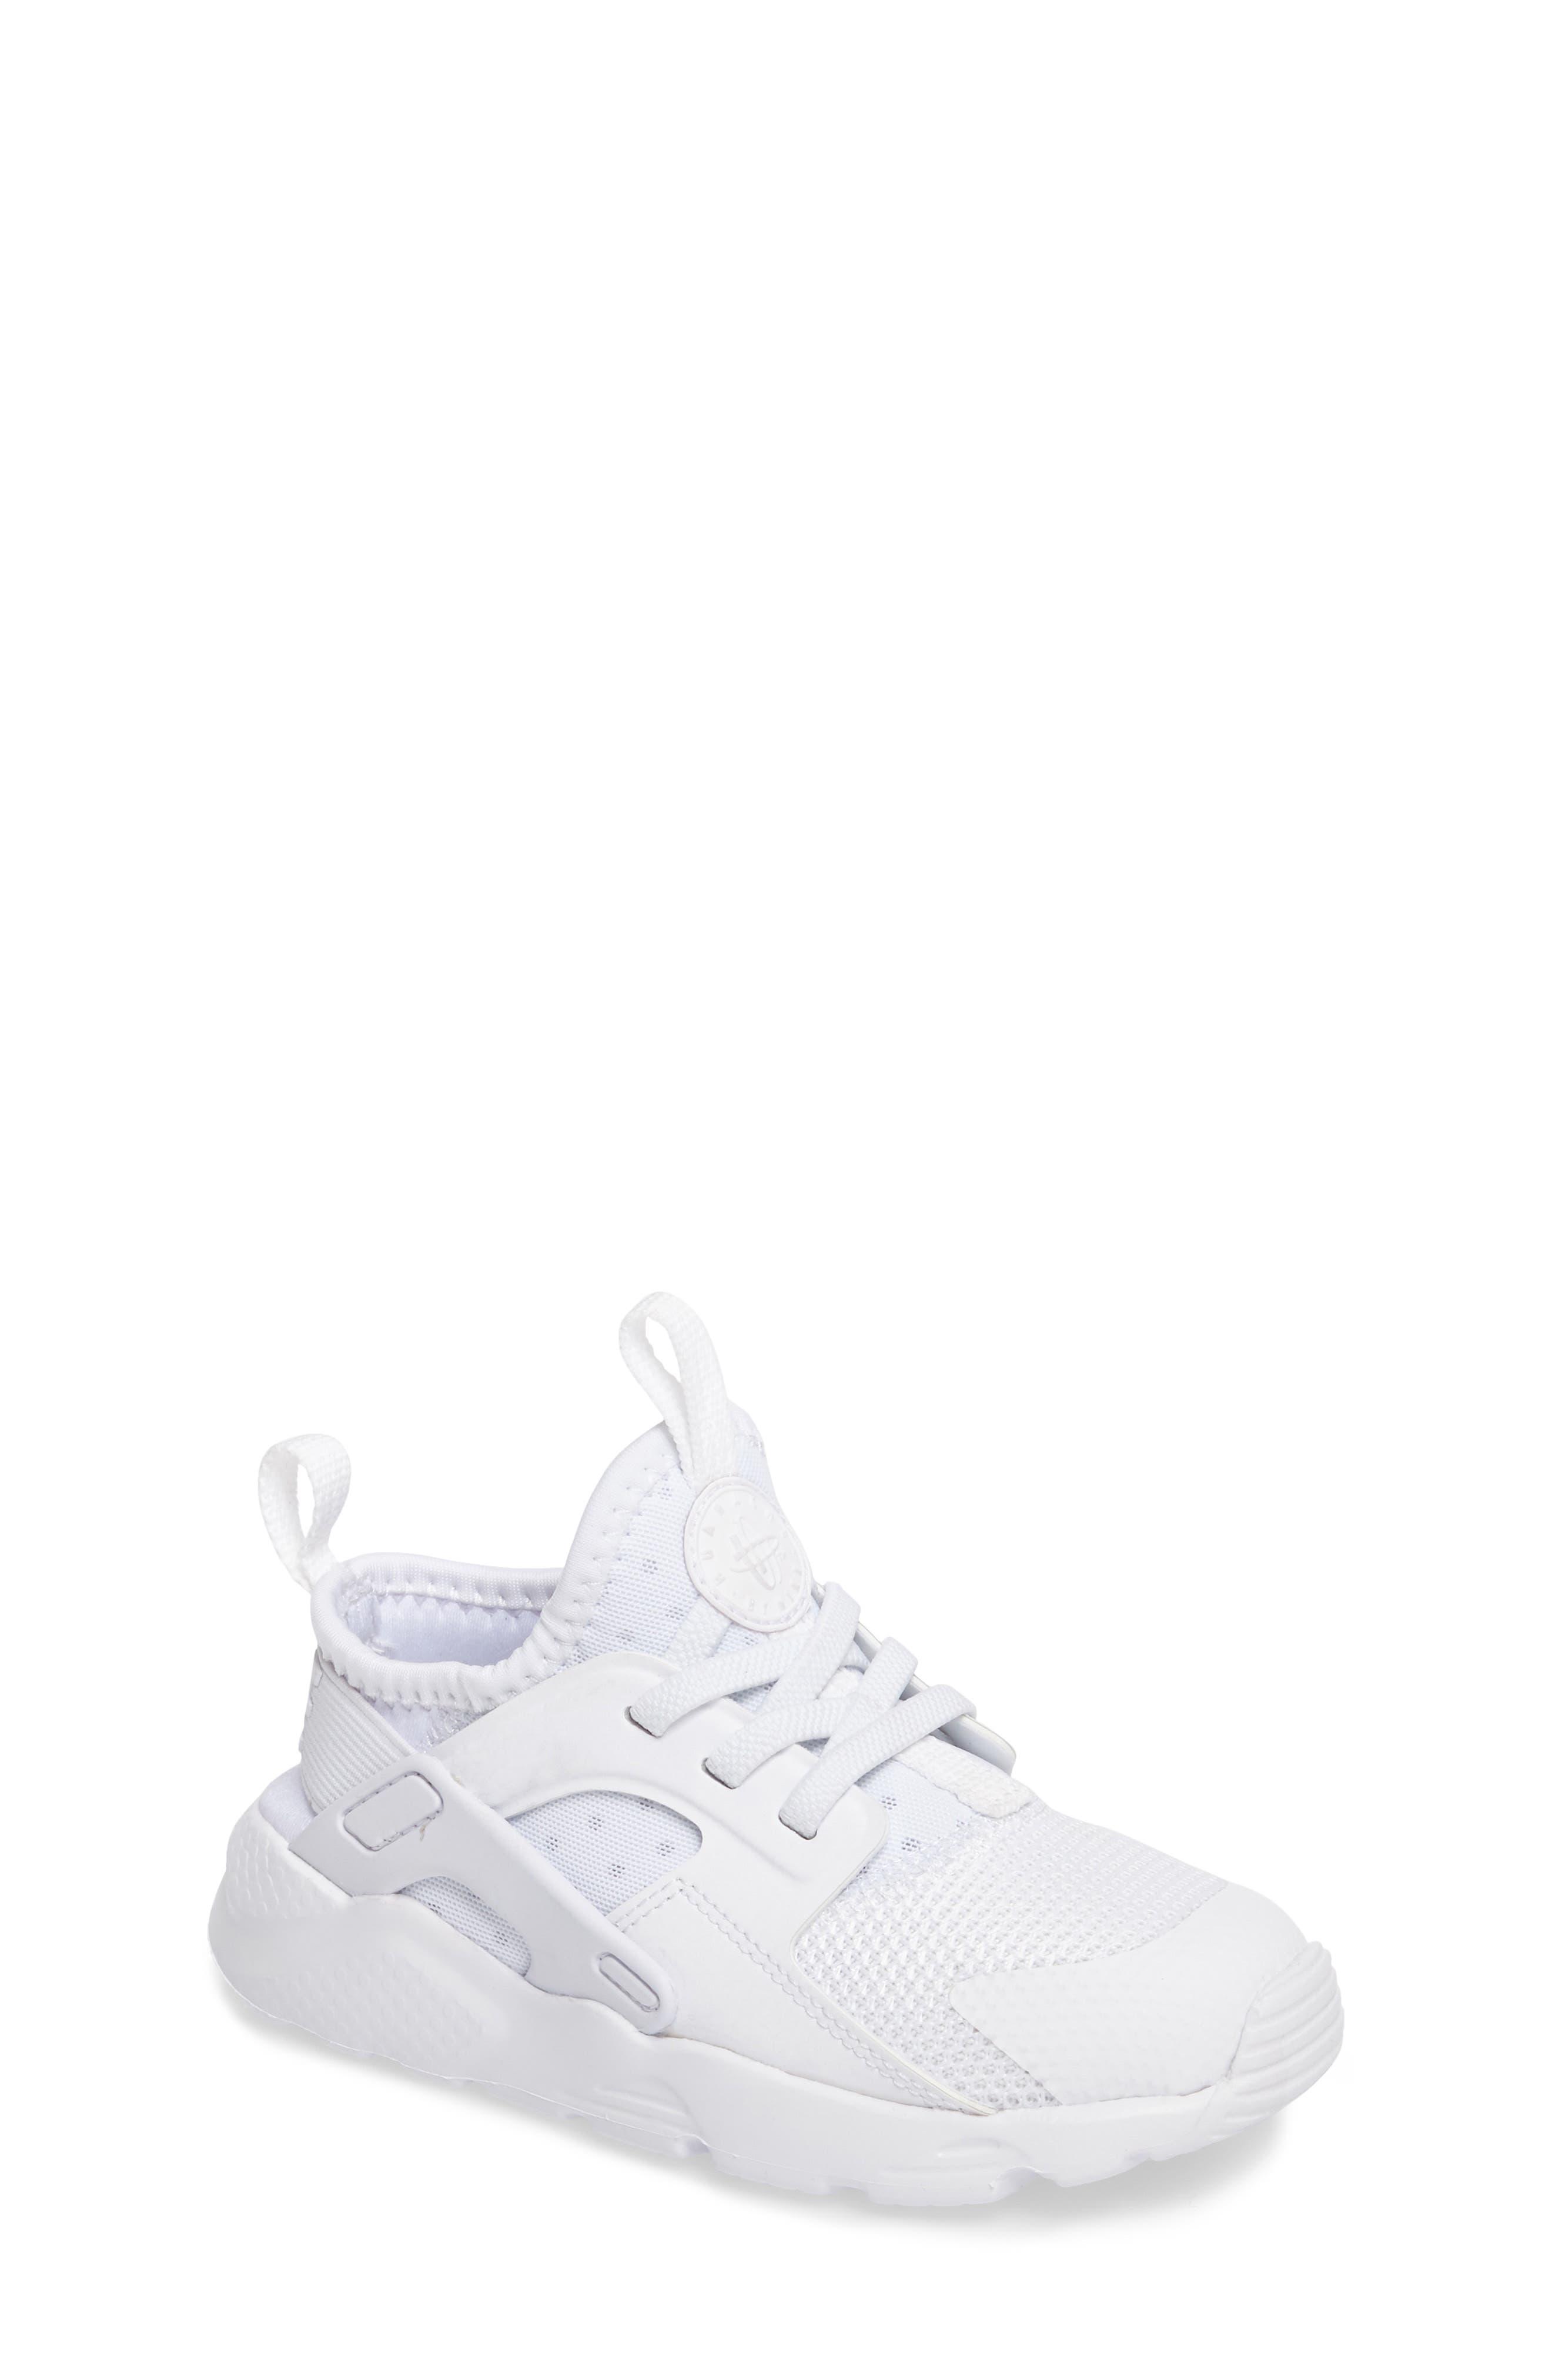 Alternate Image 1 Selected - Nike Huarache Run Ultra Sneaker (Baby, Walker & Toddler)